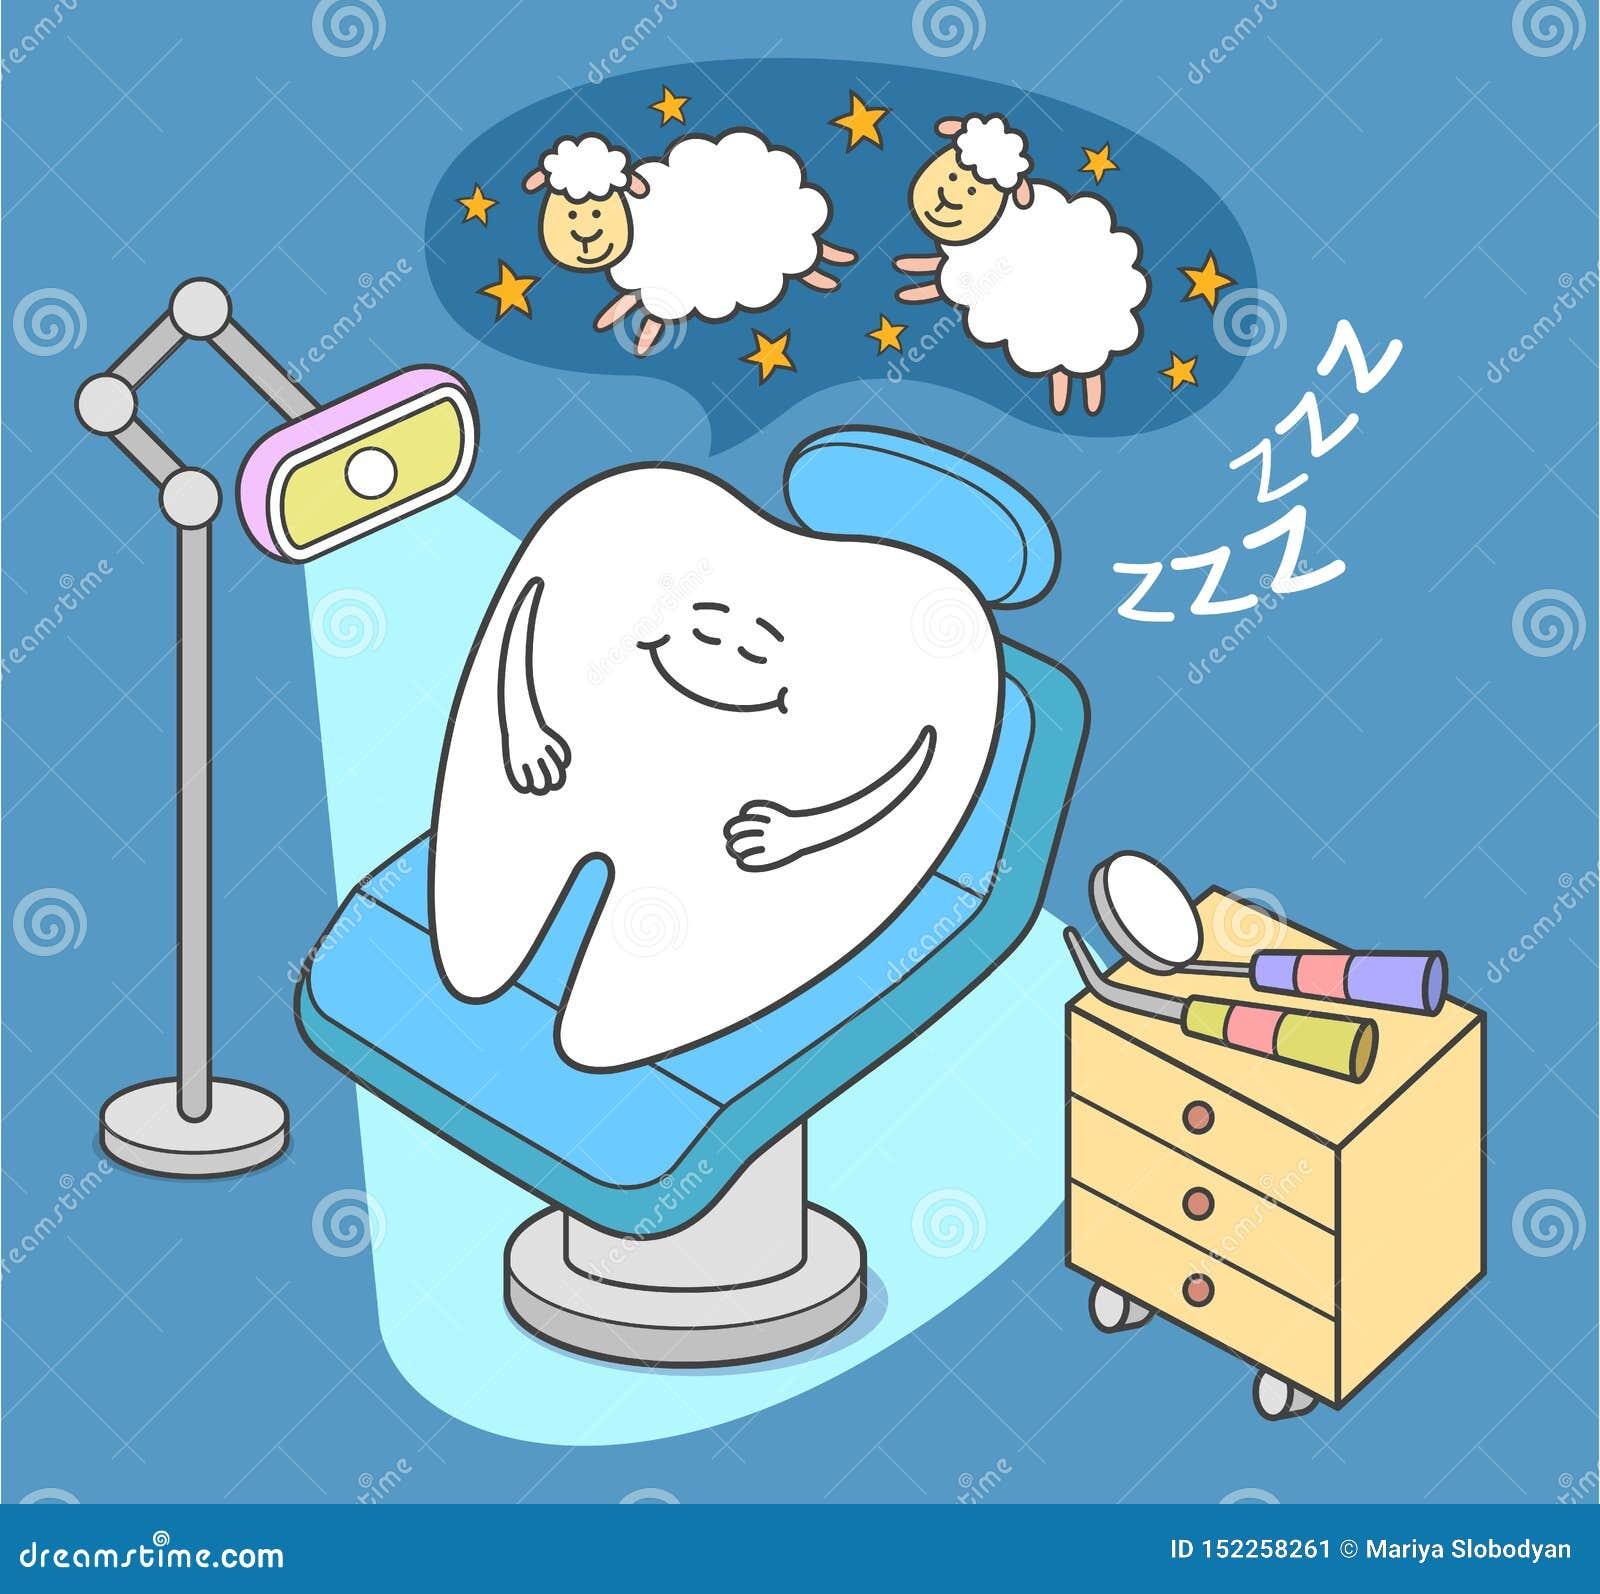 Anesthesia Cartoon